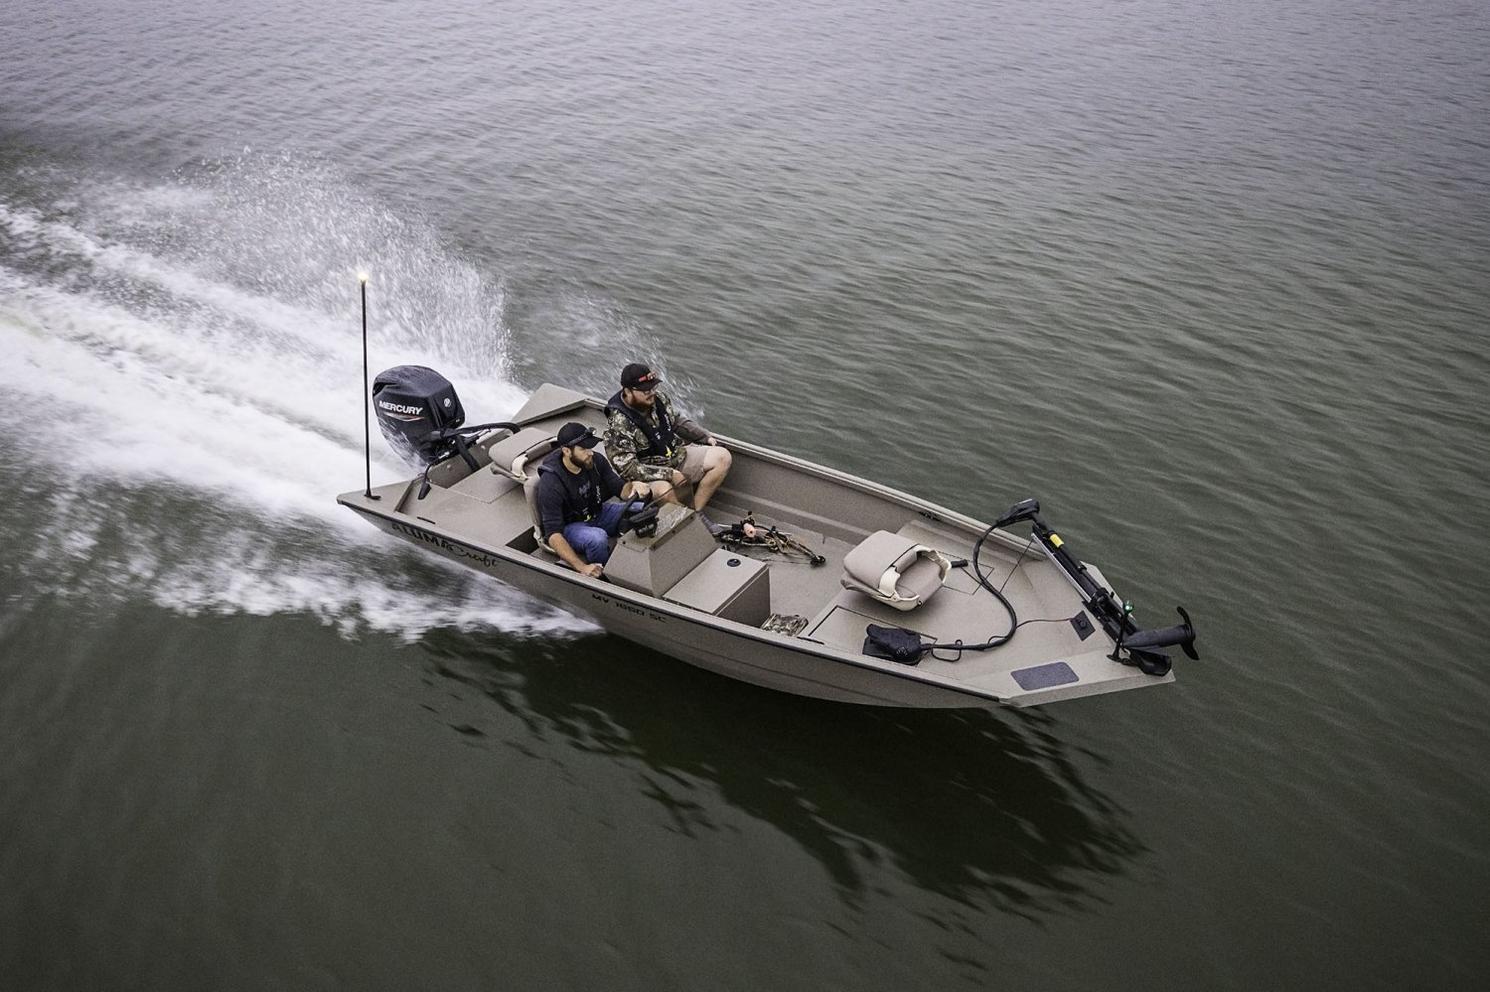 2021 Alumacraft boat for sale, model of the boat is Alumacraft All Weld MV Series MV1860 AW SC & Image # 8 of 10